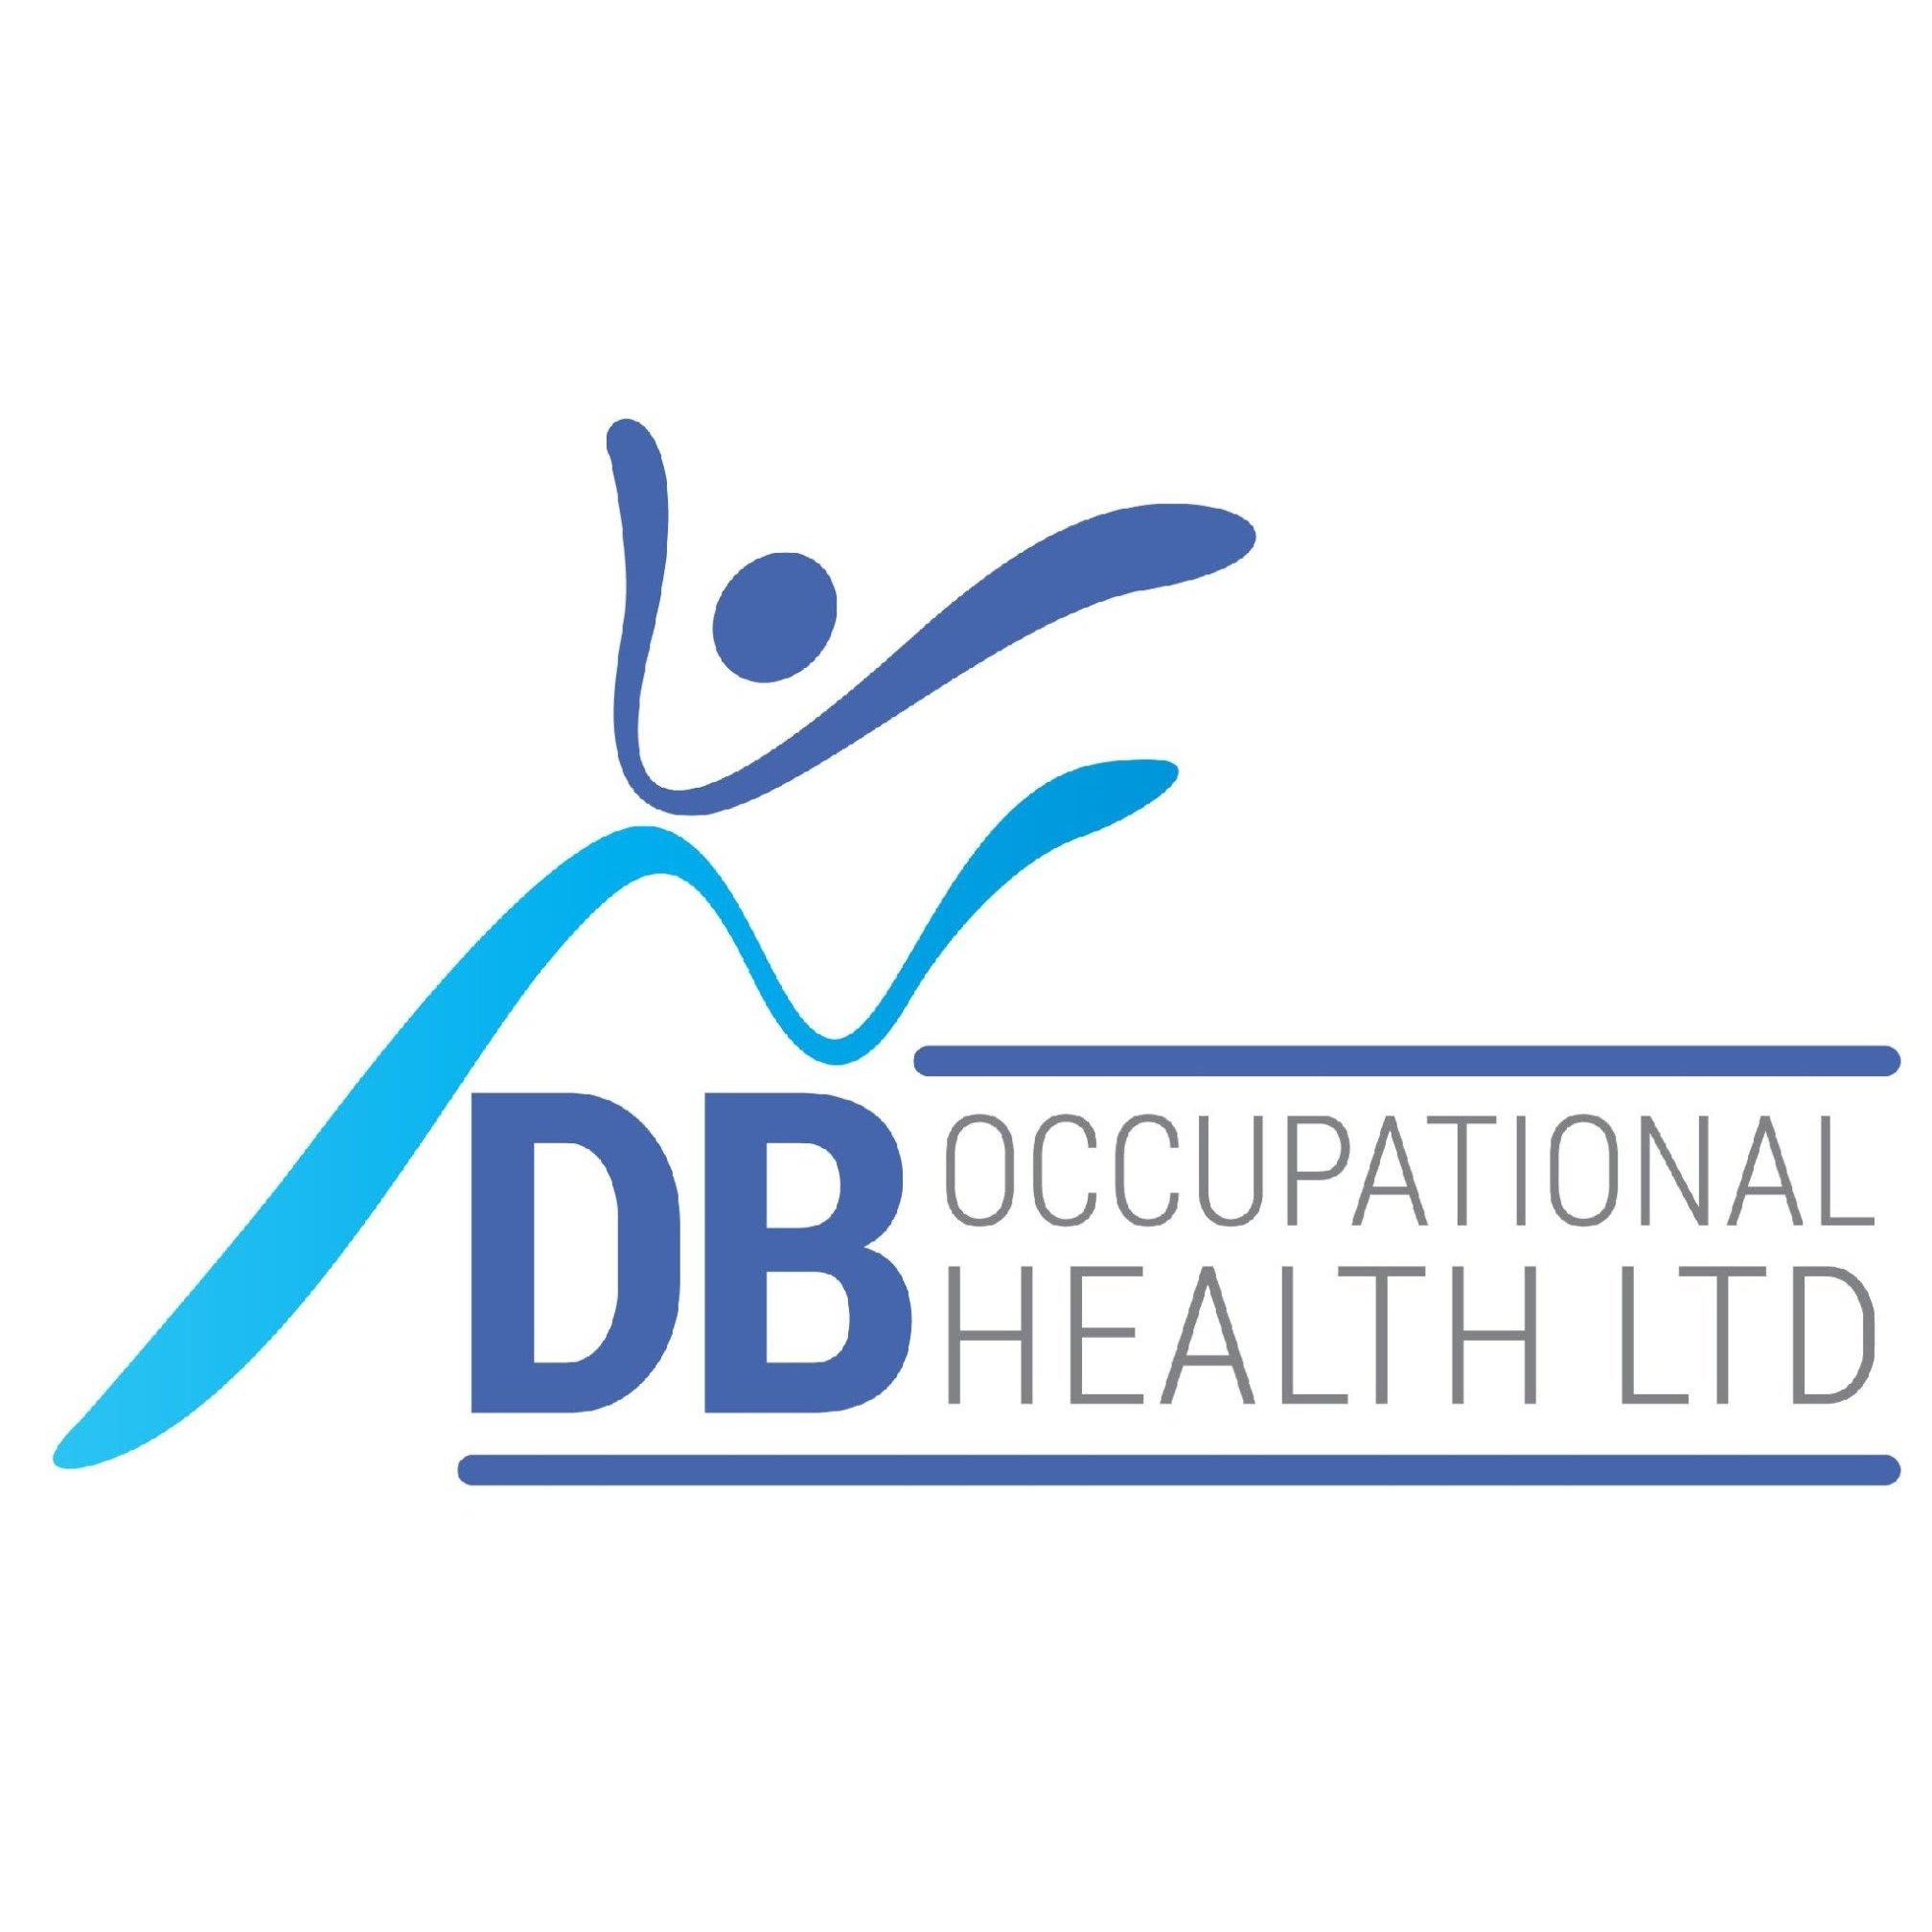 David Barber (OH) Ltd - Derby, Derbyshire DE72 2GH - 07581 489050 | ShowMeLocal.com